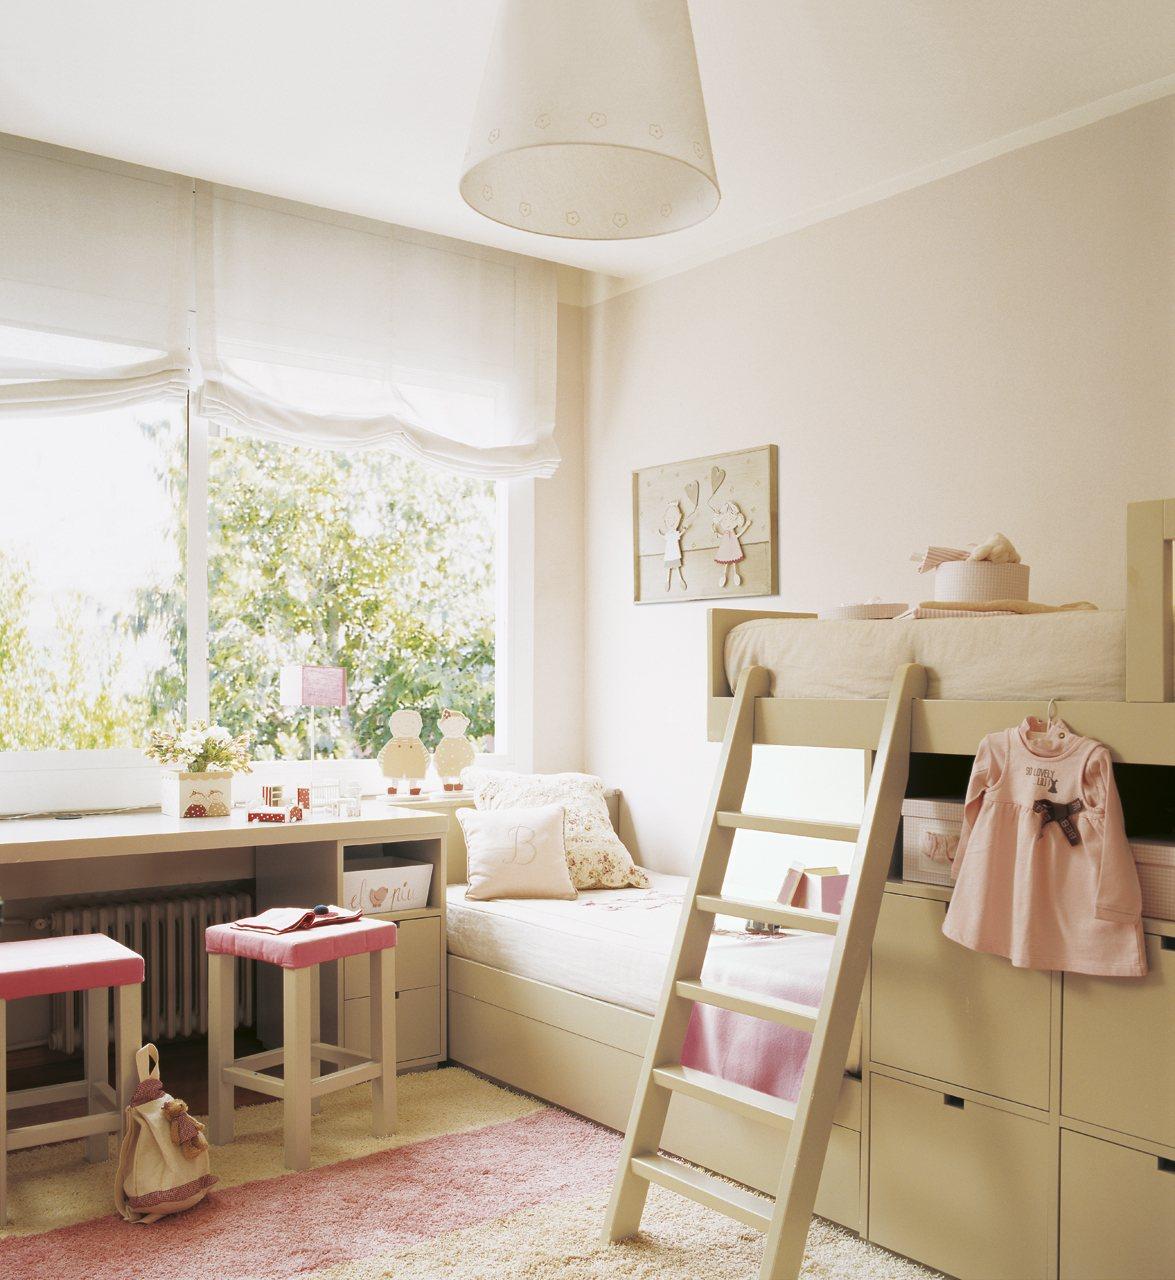 Dormitorios infantiles peque os s cales partido for Dormitorios con literas